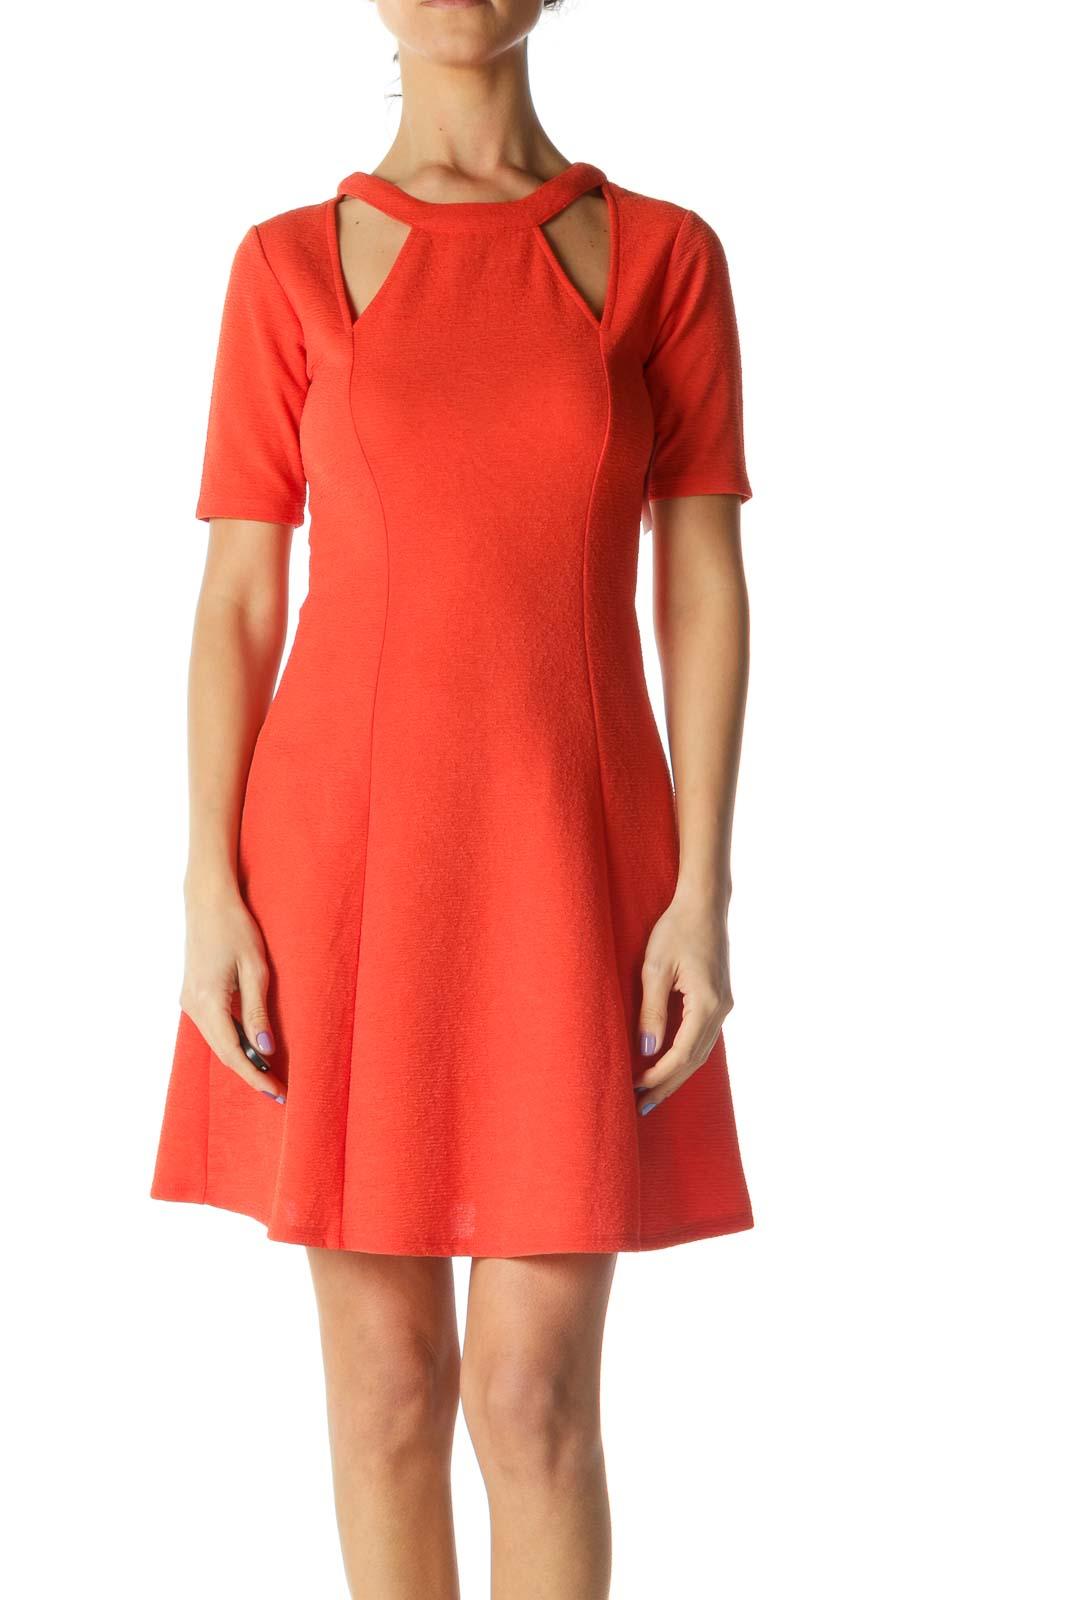 Orange Textured Cutout Cocktail Dress Front